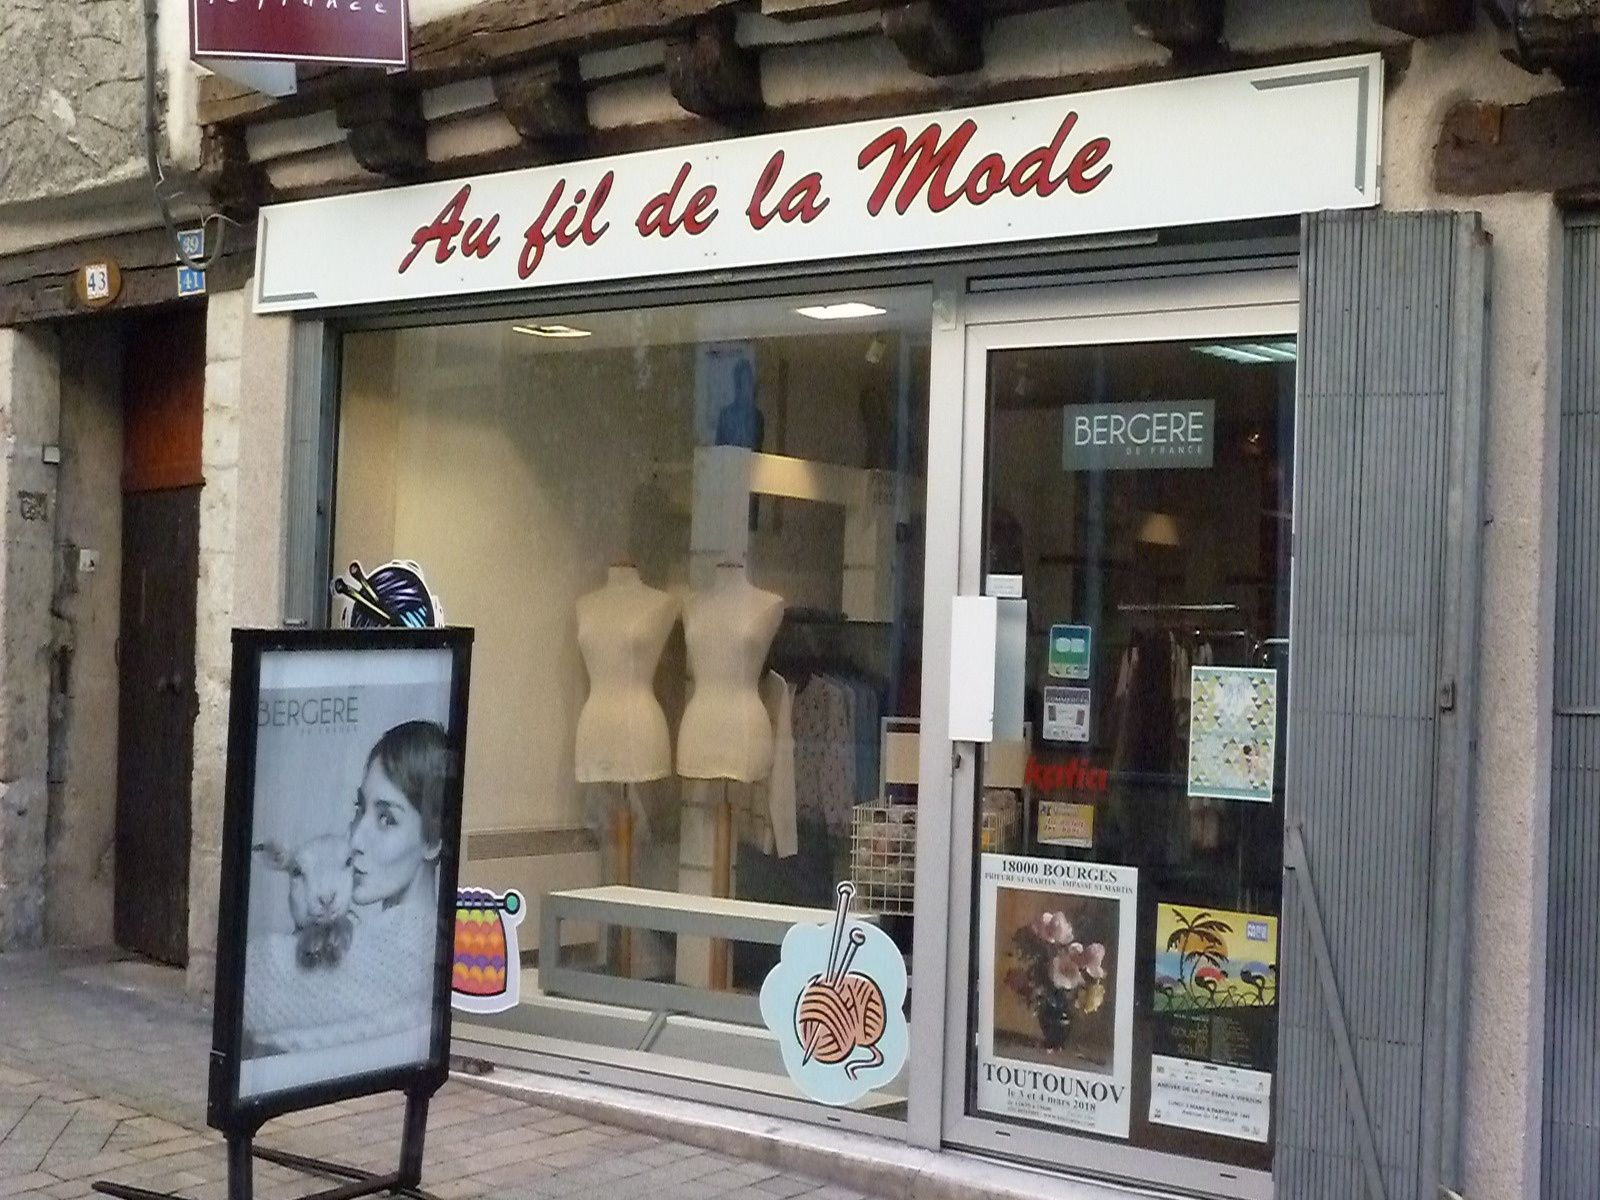 Rue Joffre, le magasin Au fil de la mode fermera fin juillet